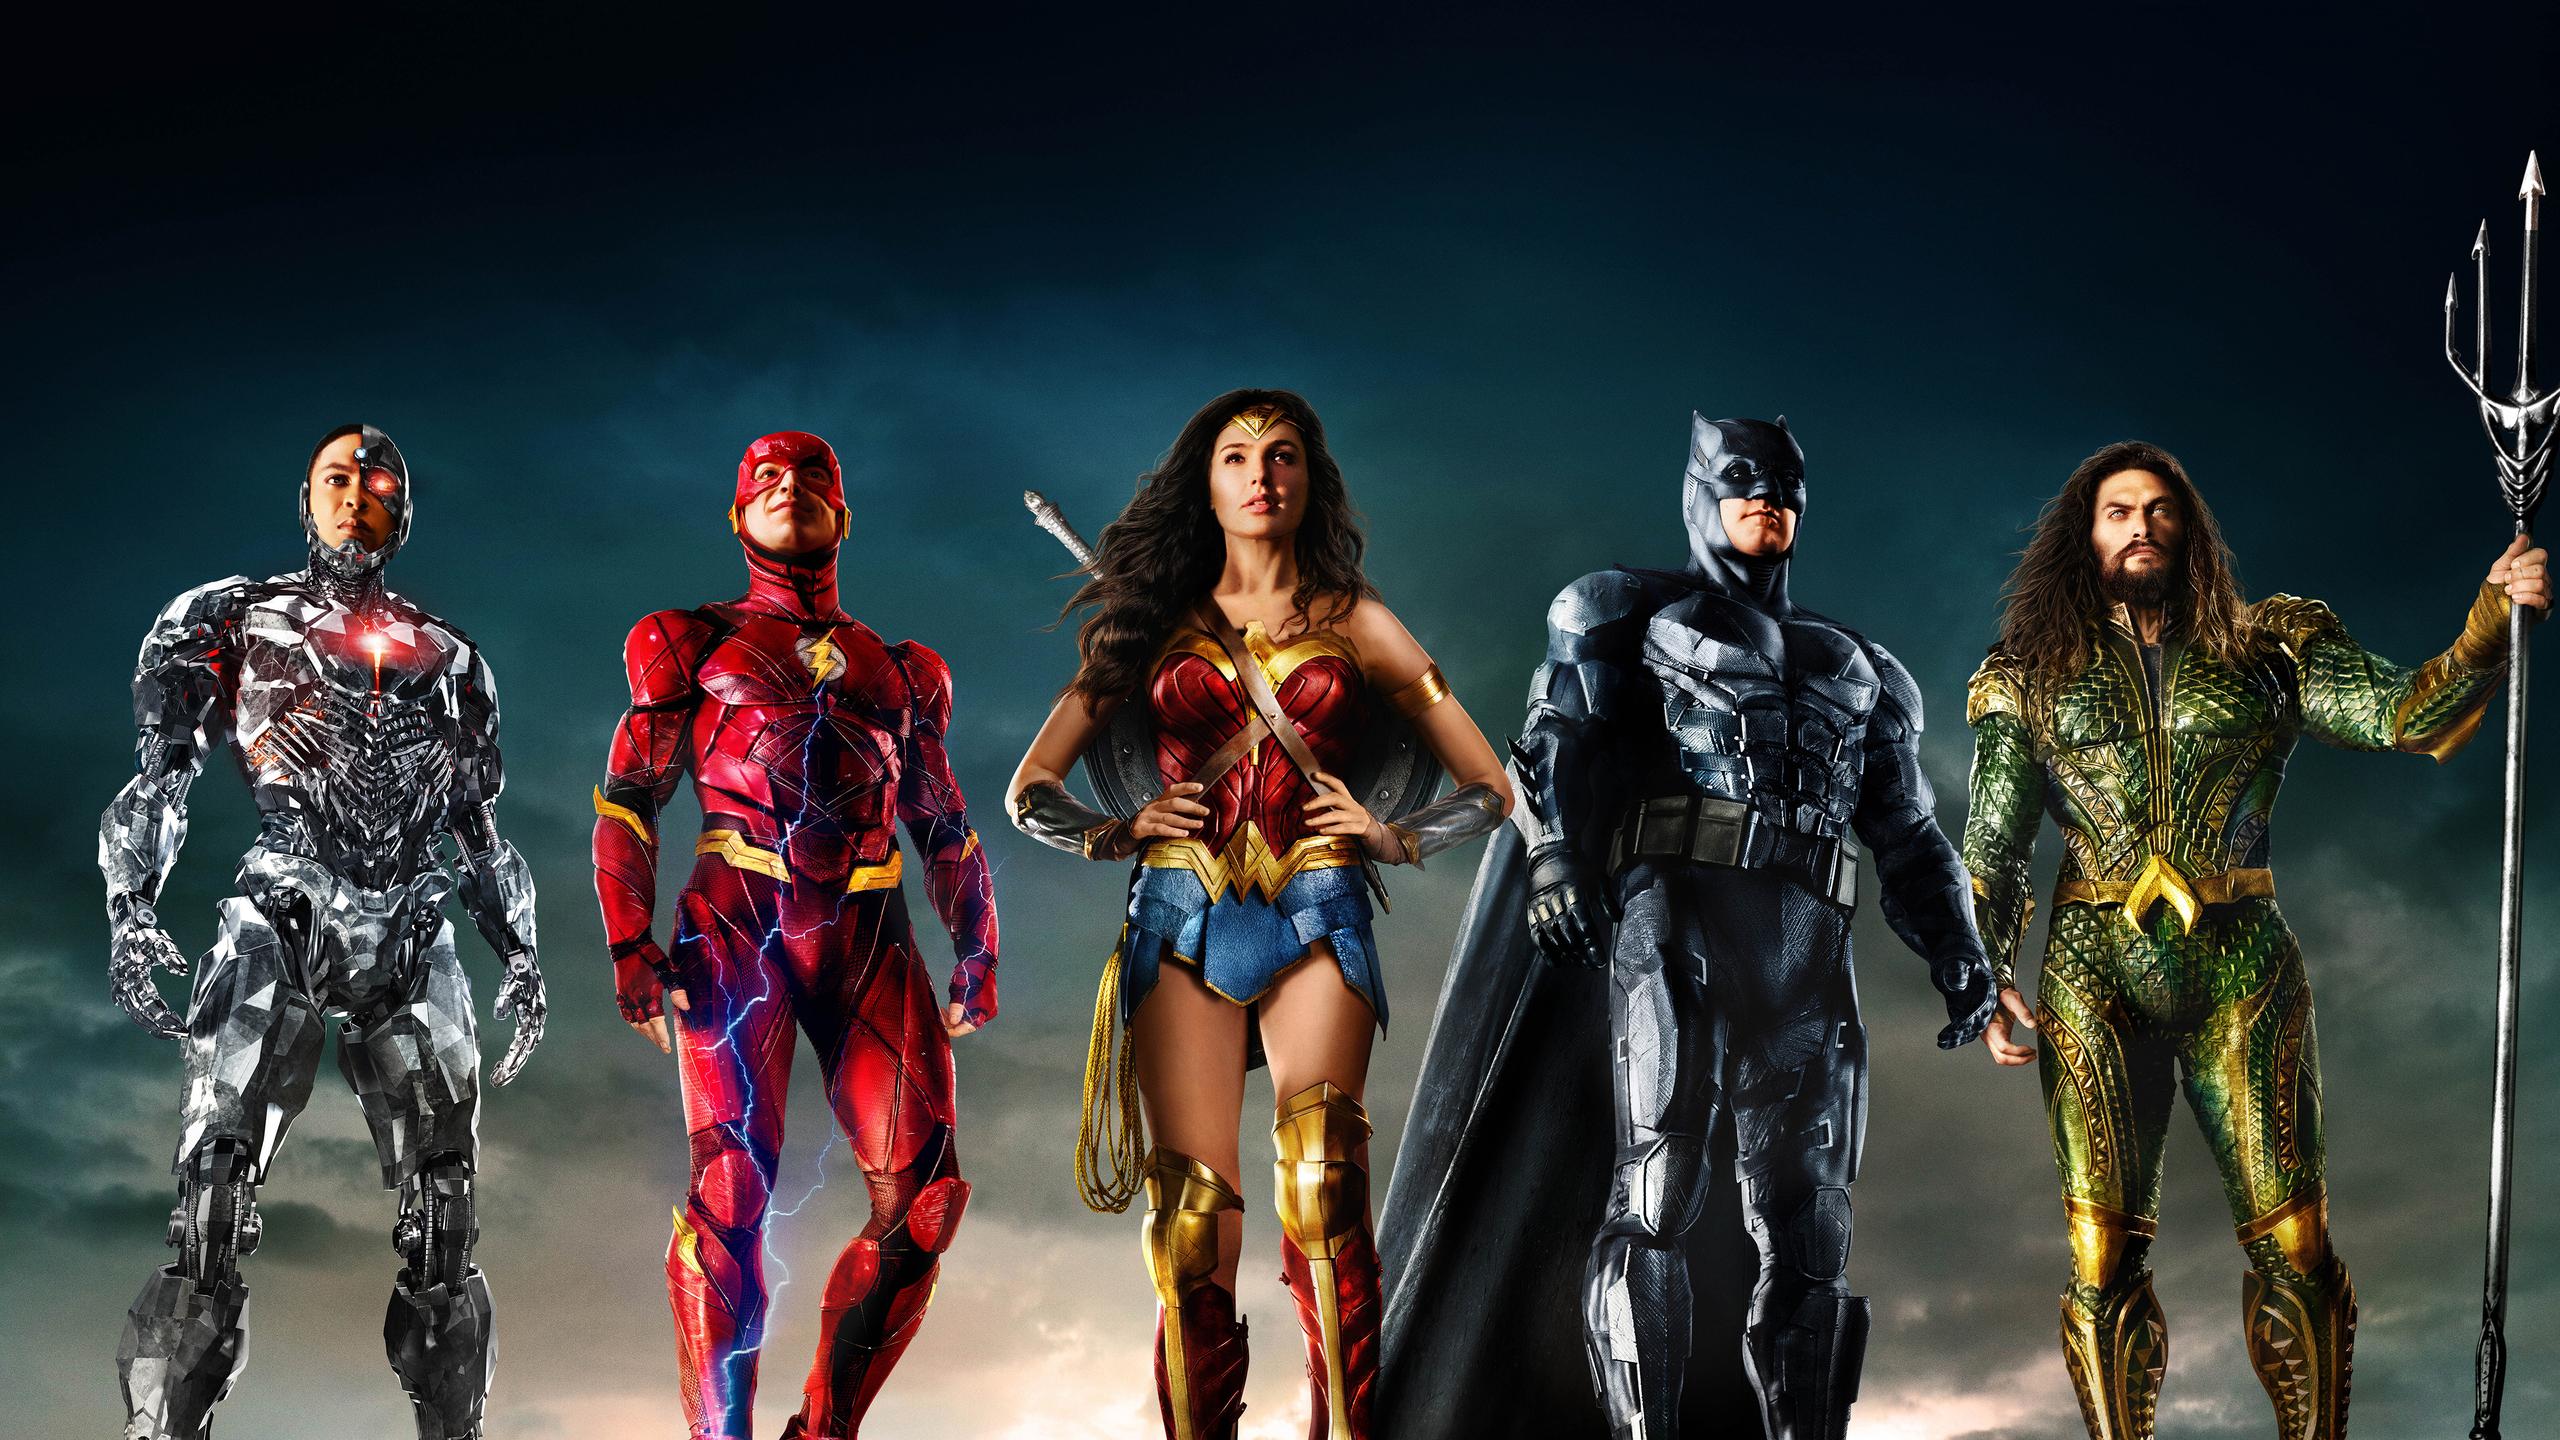 justice-league-2017-5k-ql.jpg